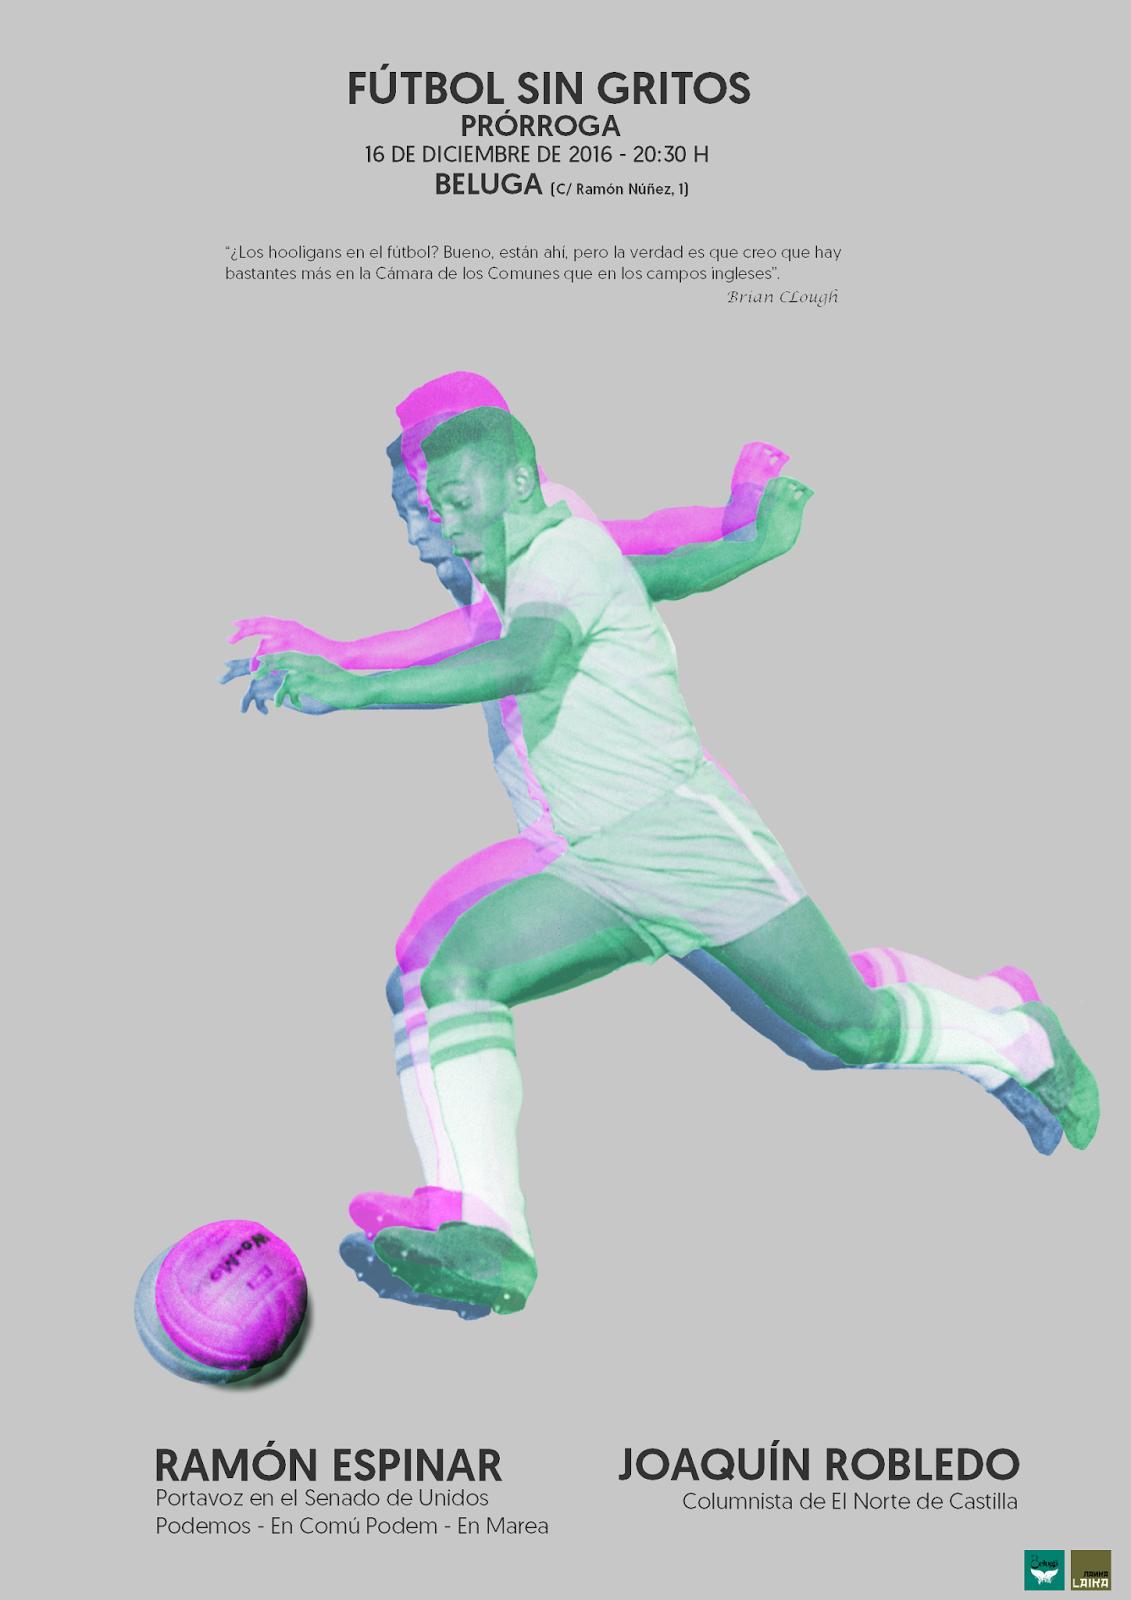 Prórroga de Fútbol sin gritos 2016